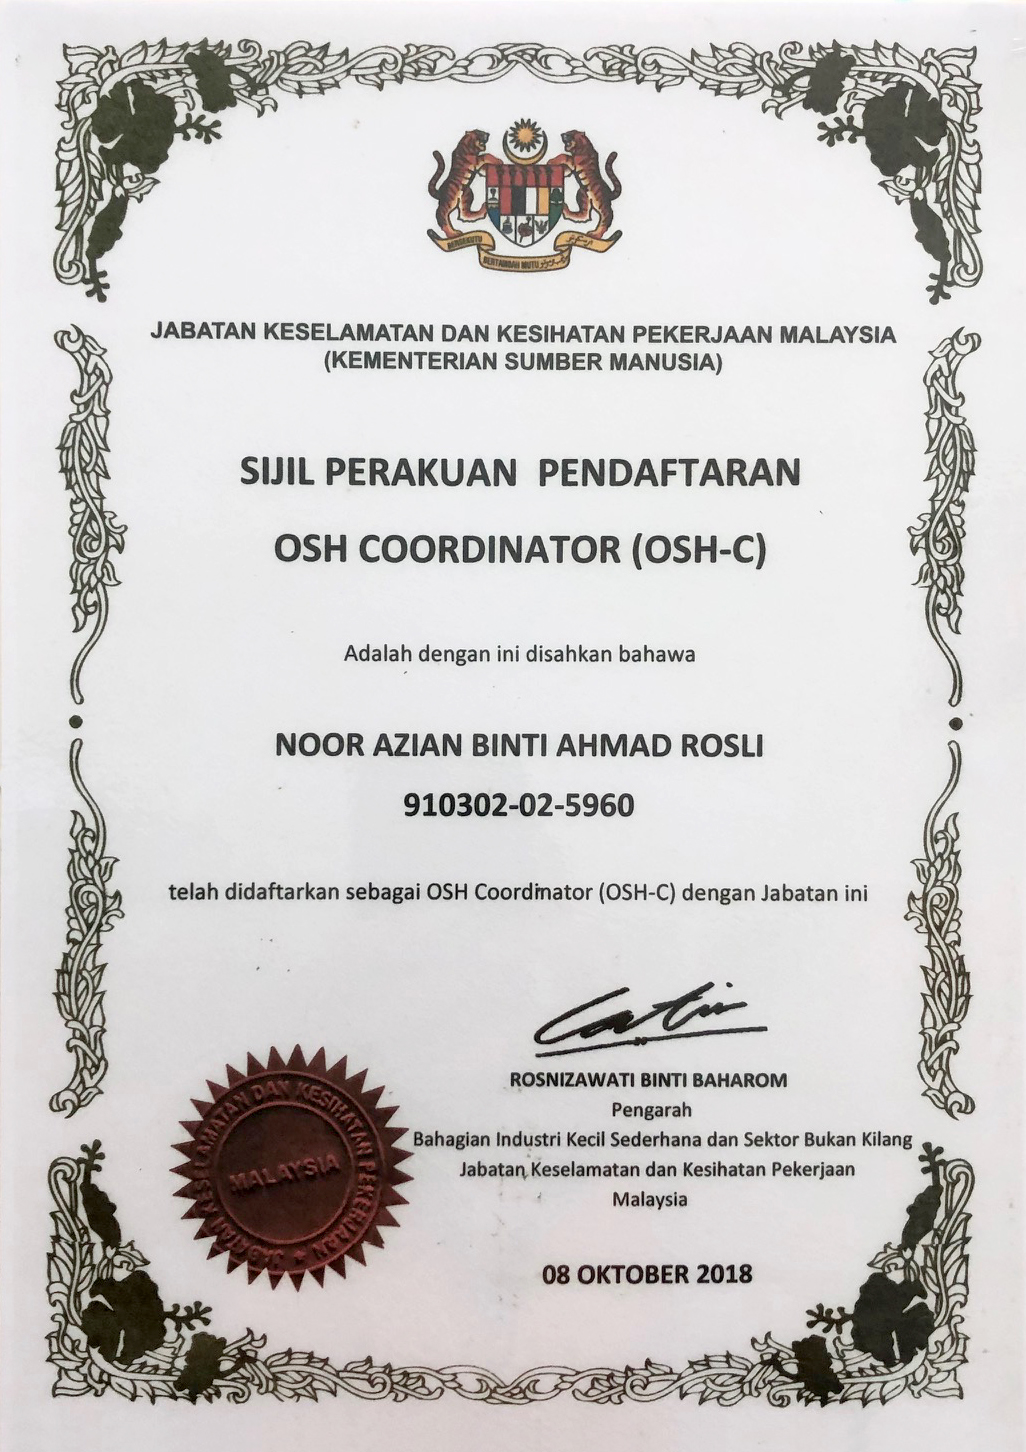 OSH Coordinator 2018